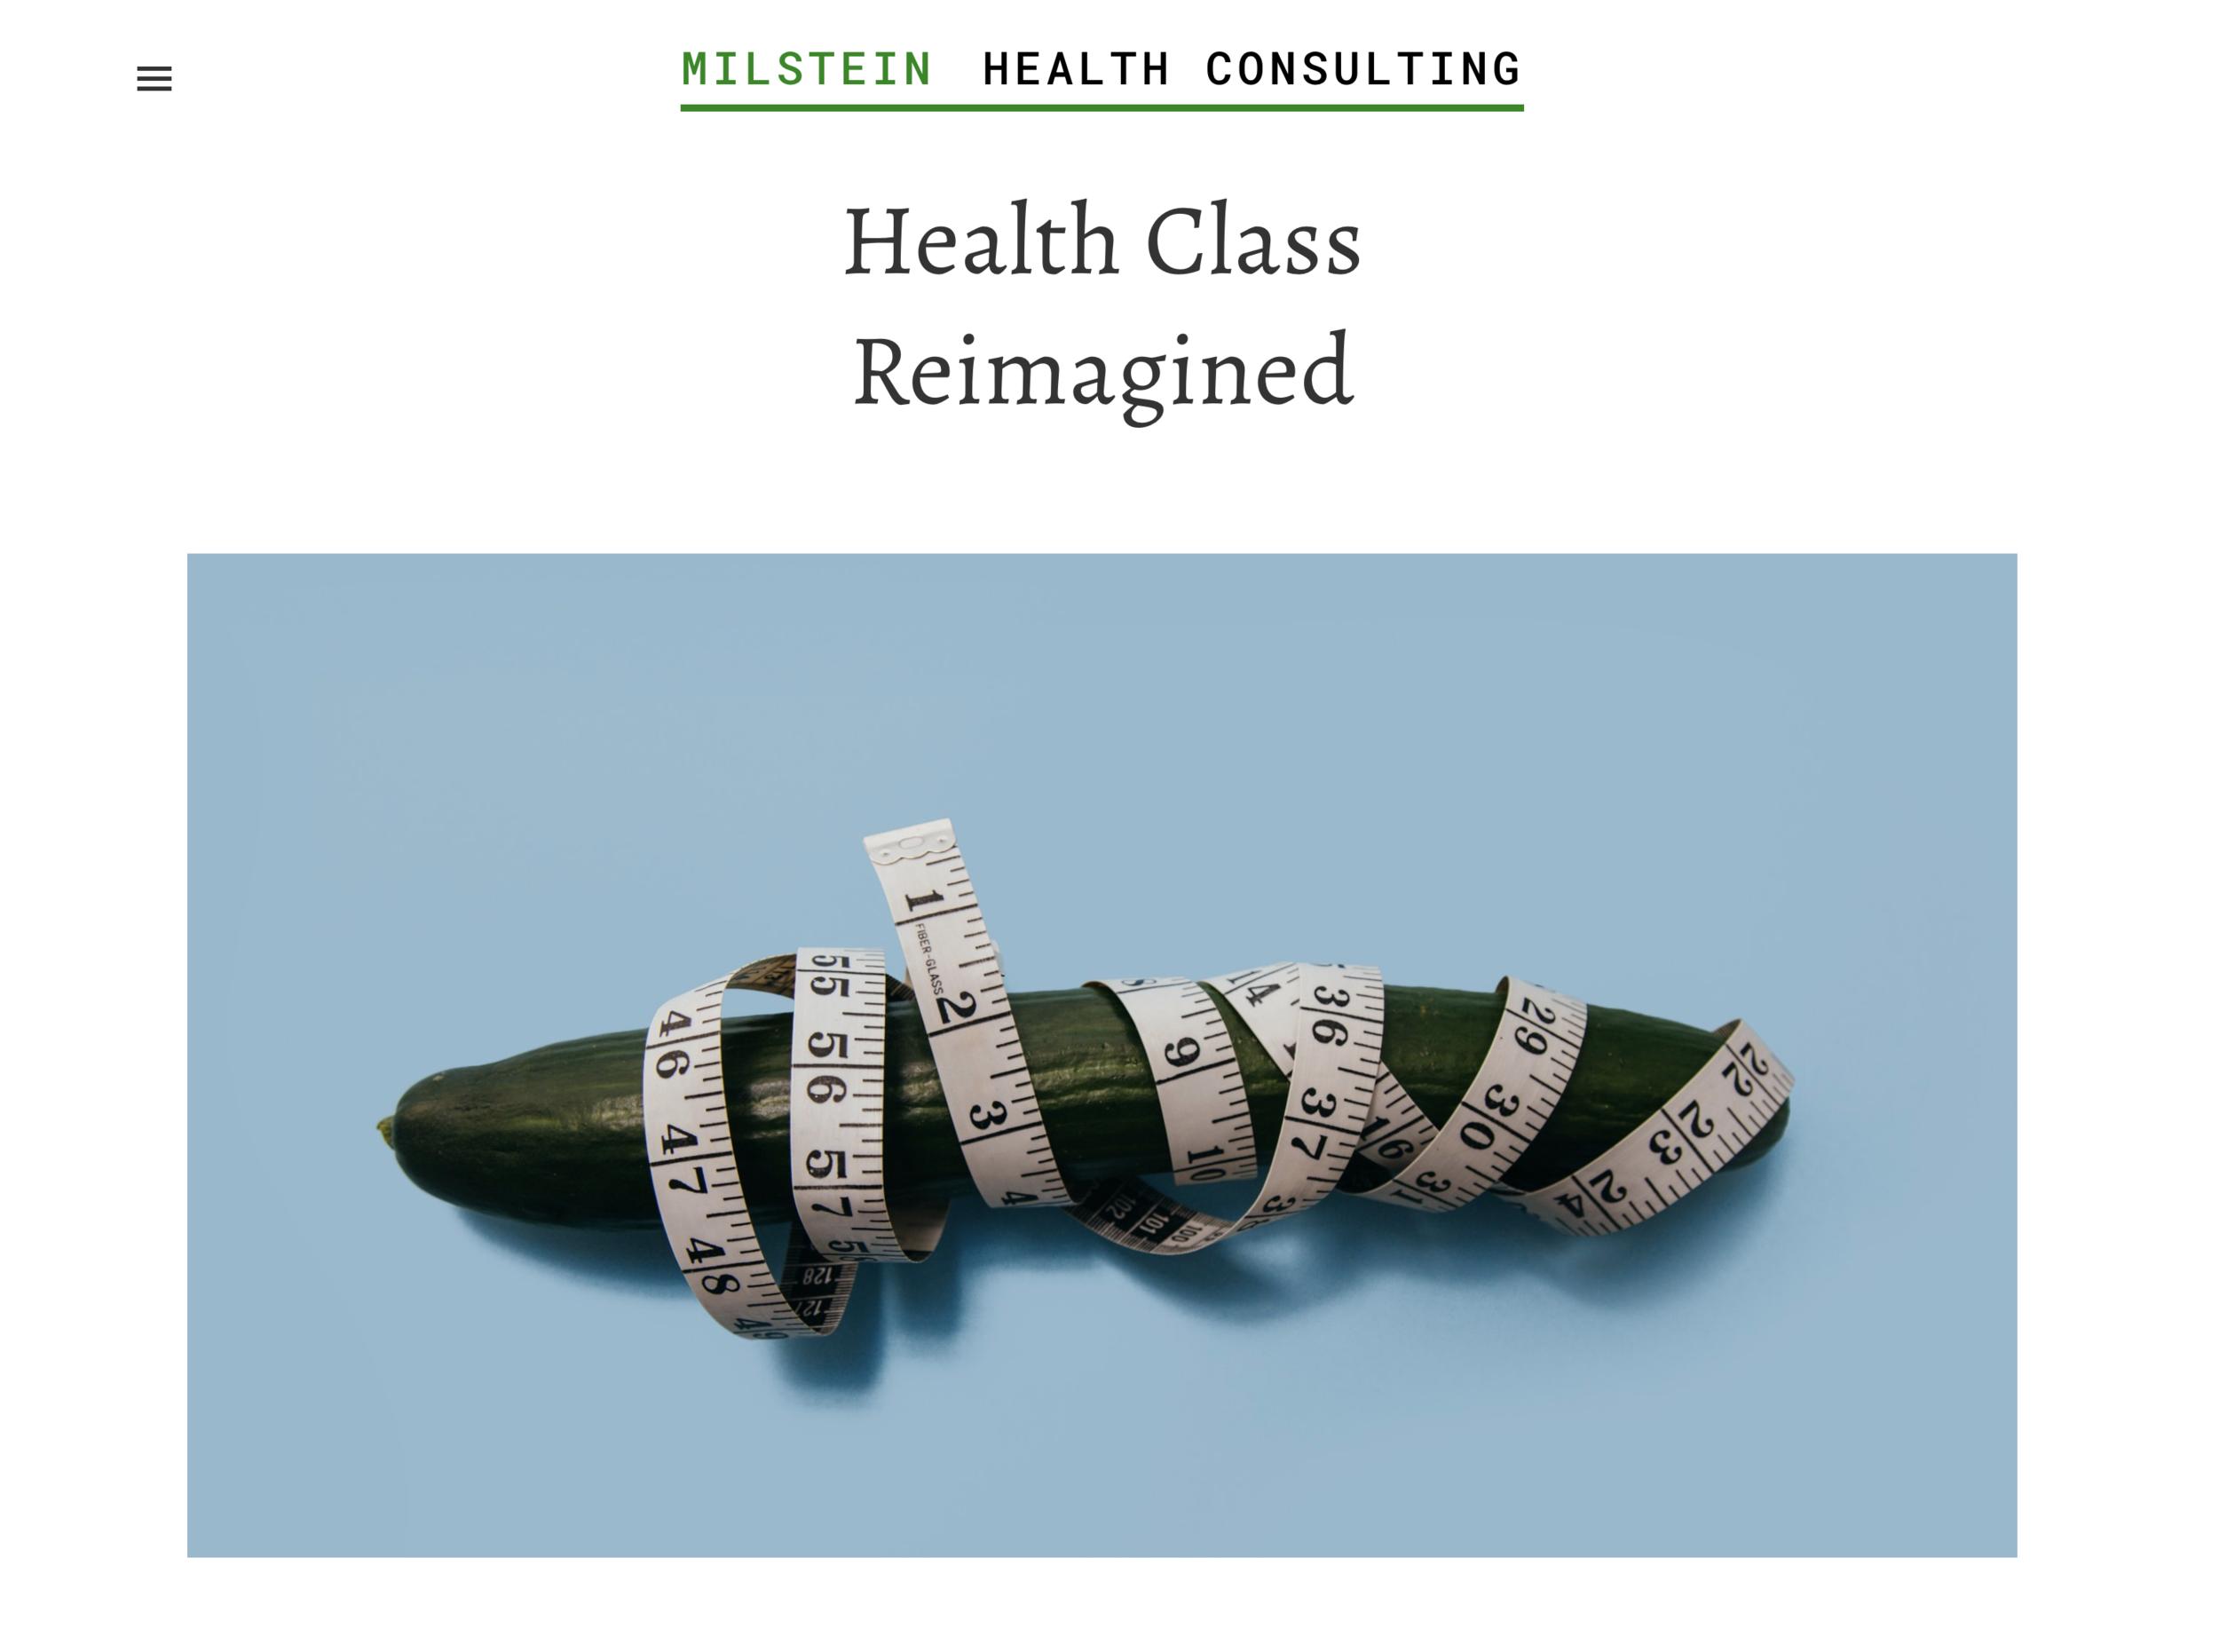 milstein health consulting